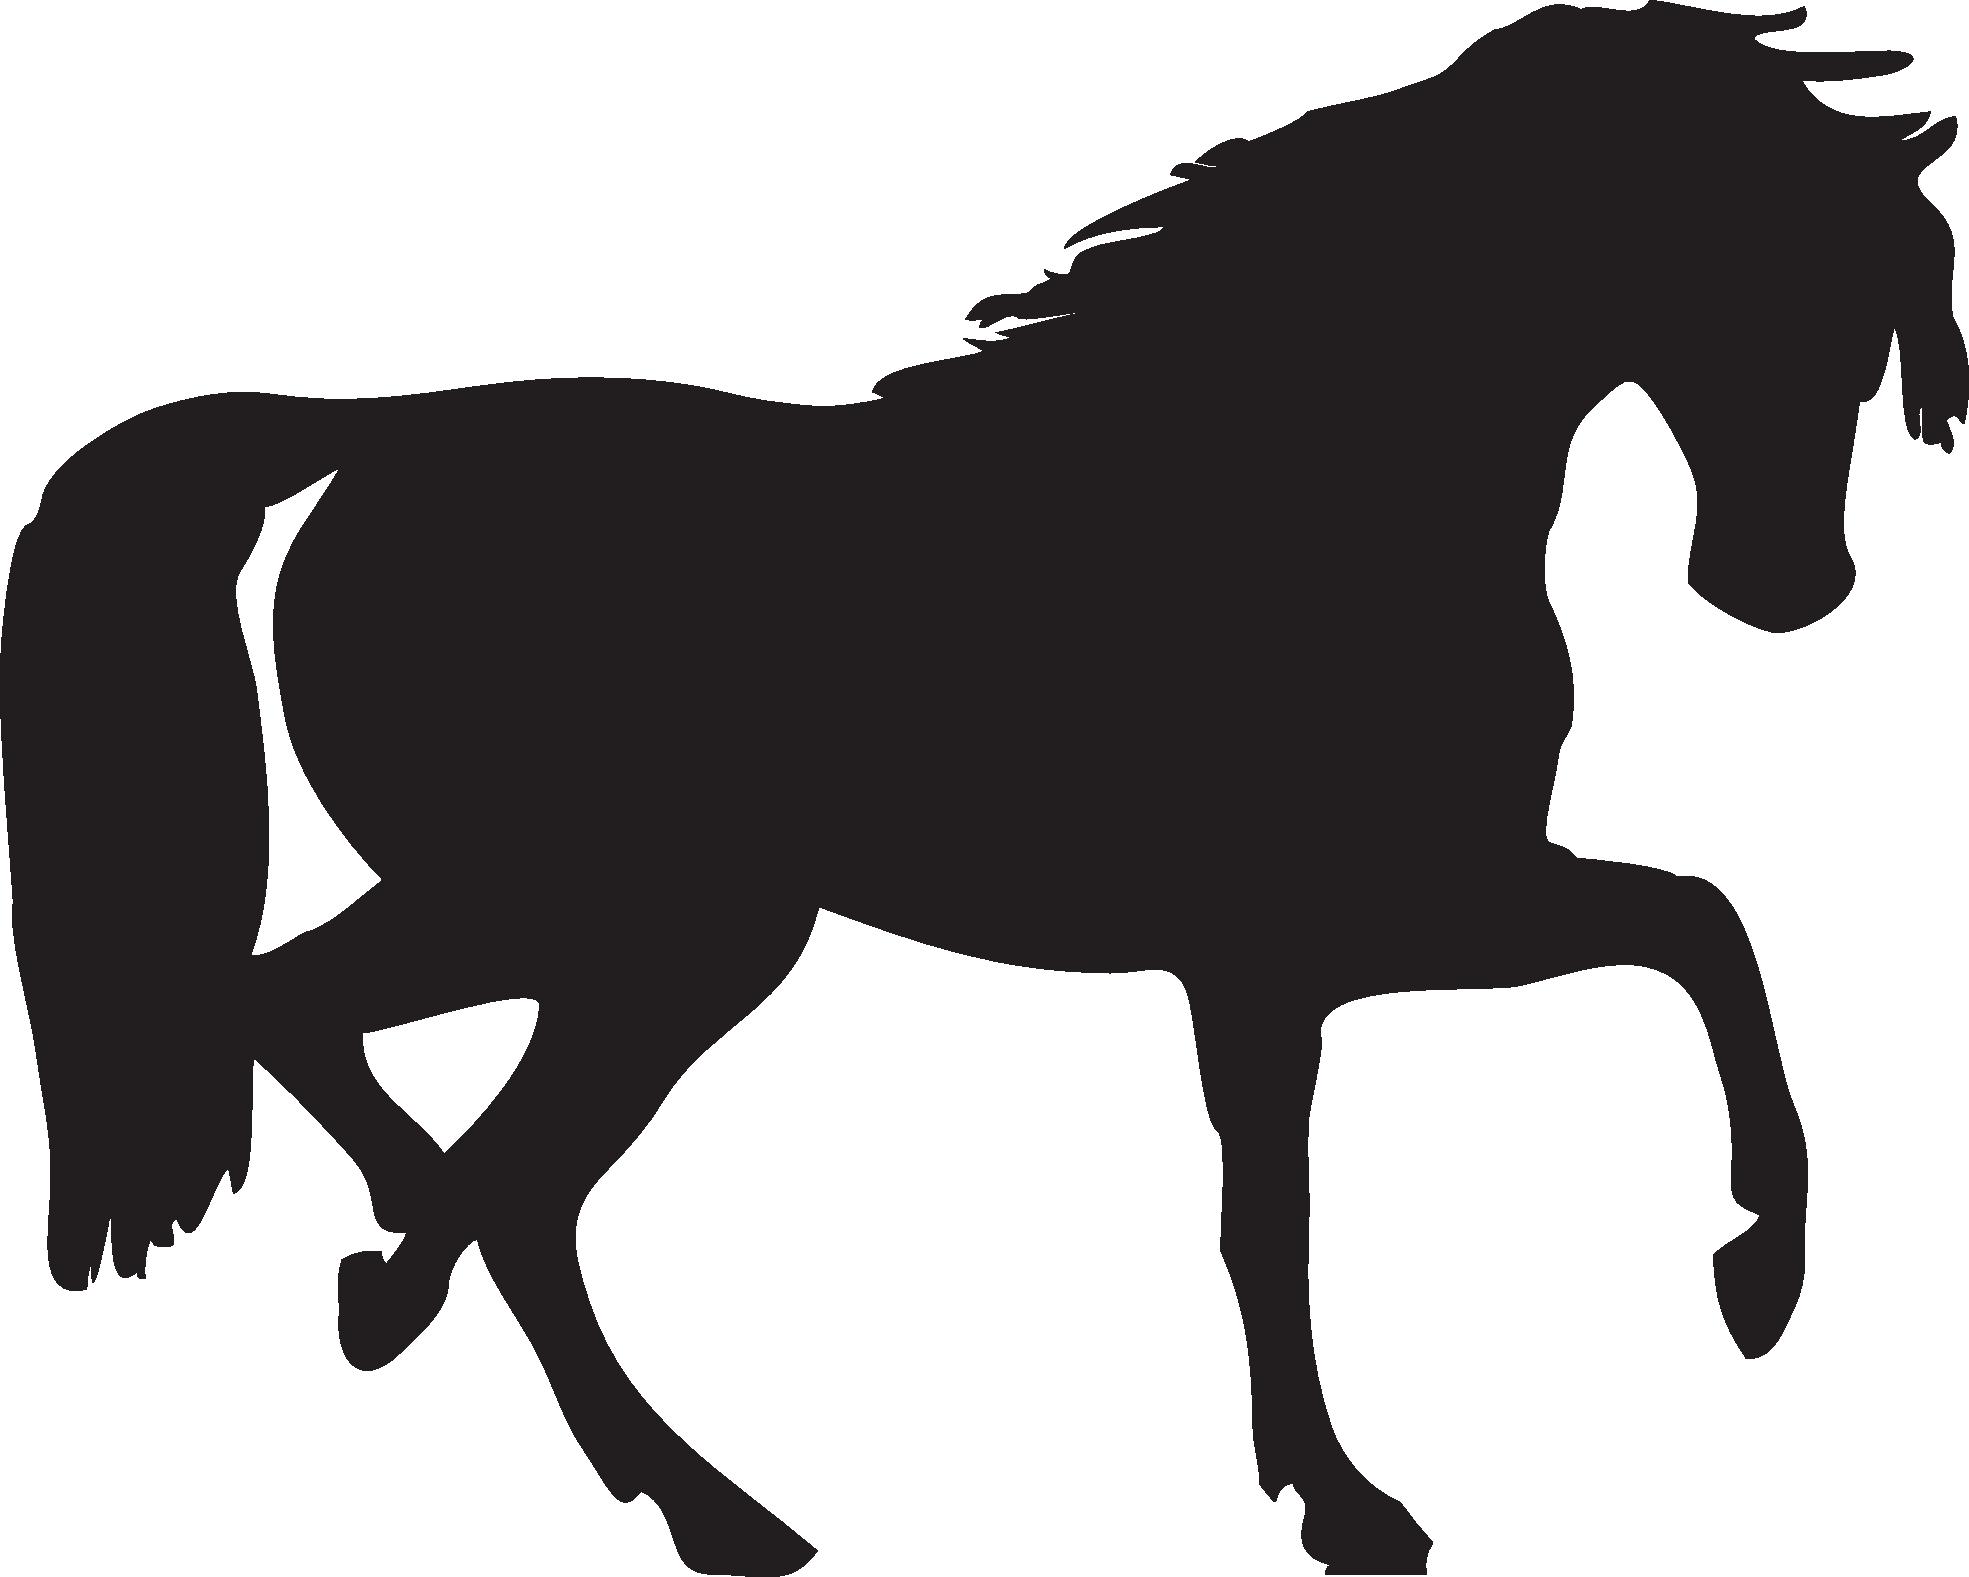 Black Horse Siluete Png Image Horse Silhouette Animal Silhouette Silhouette Clip Art